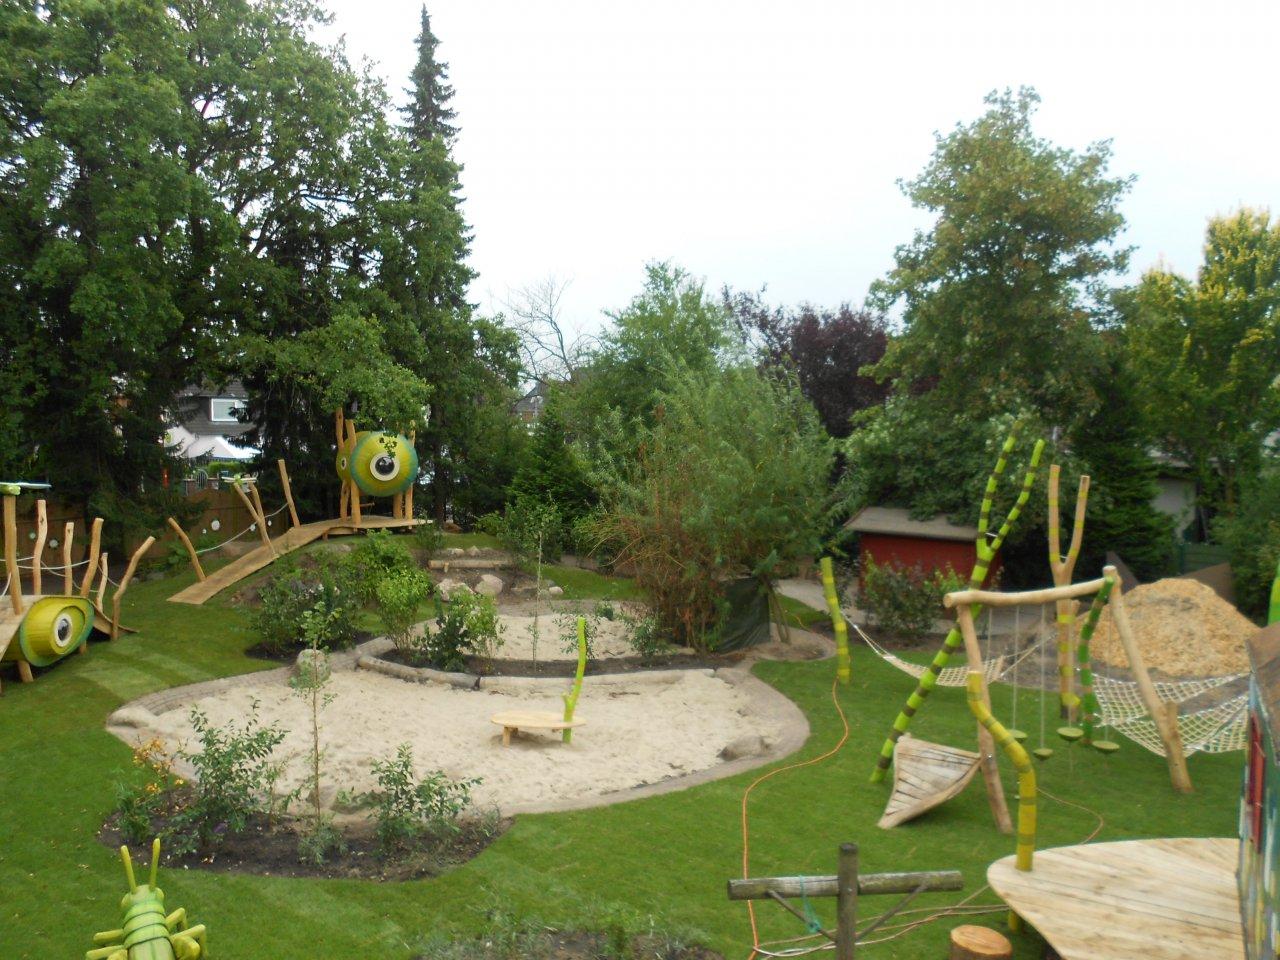 kindergarten am b hmerwald in norderstedt ot glash tte bei hamburg aktuelles. Black Bedroom Furniture Sets. Home Design Ideas